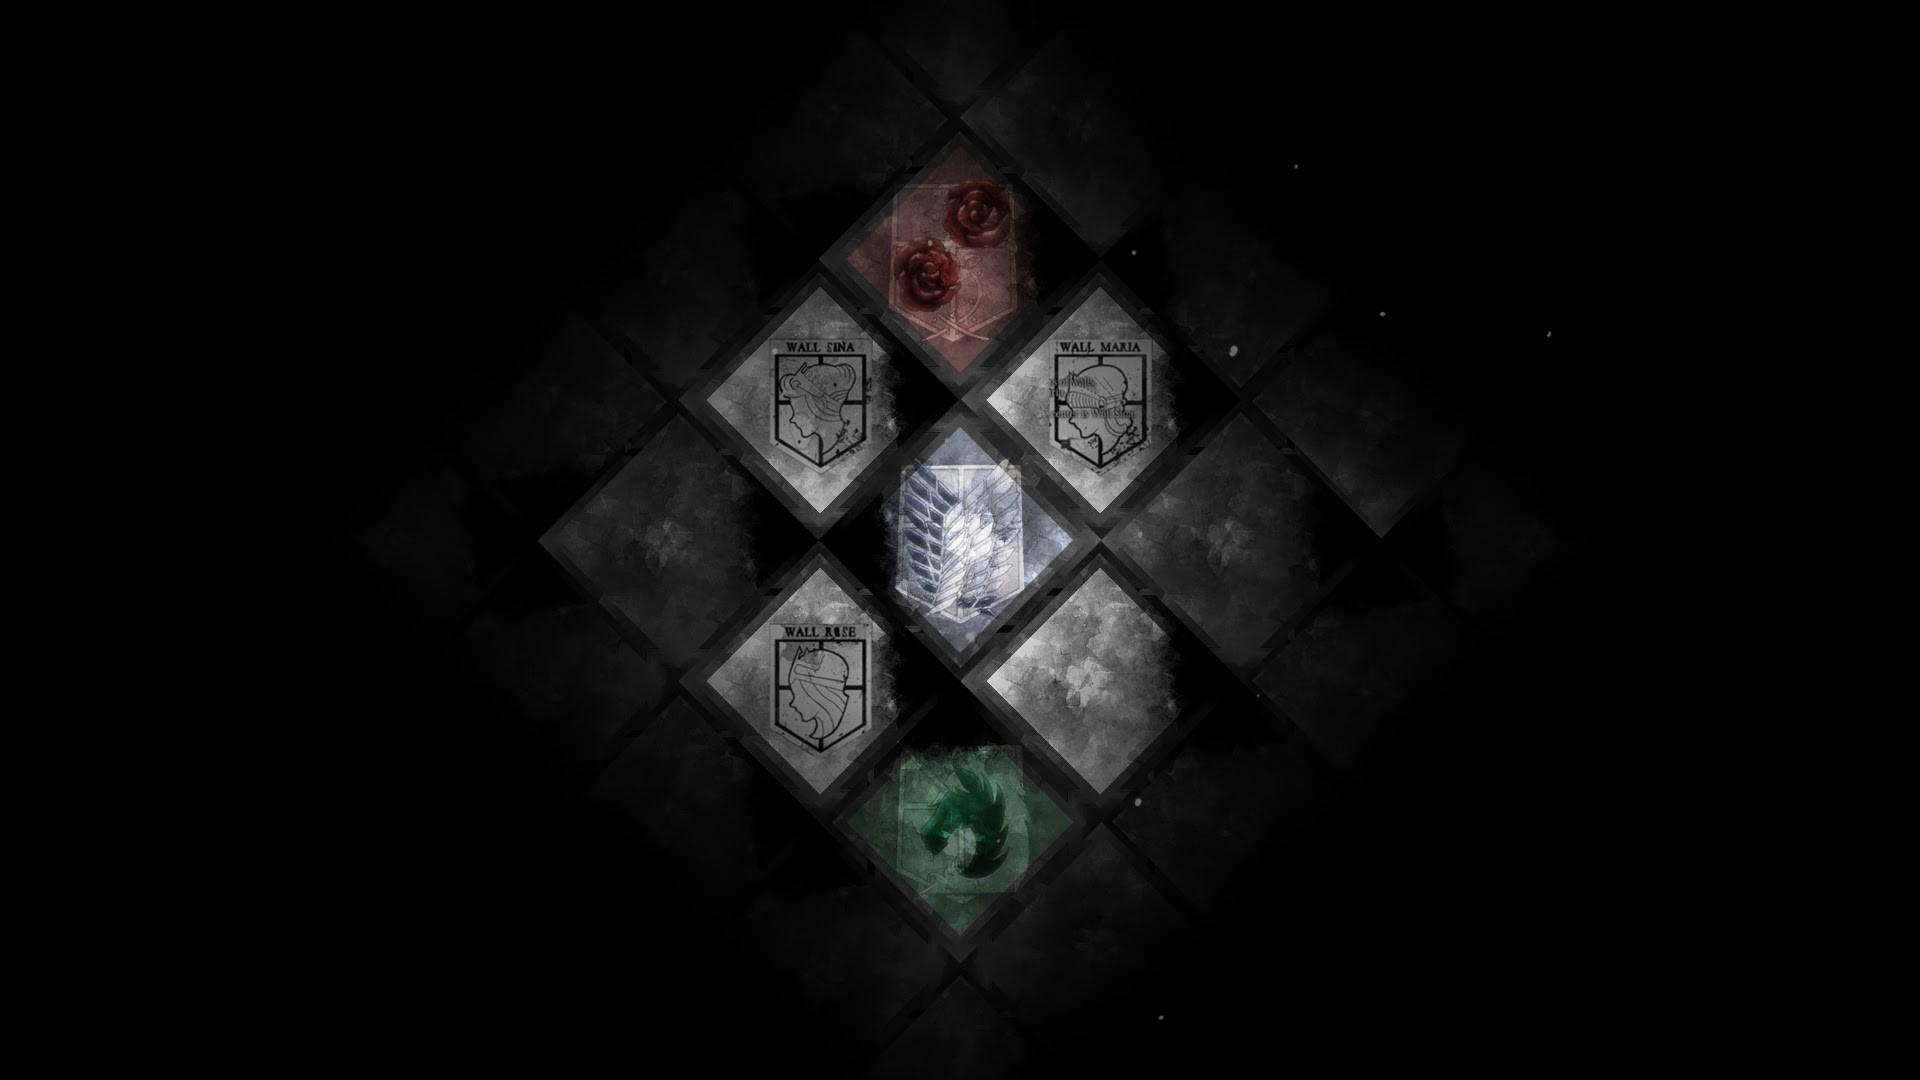 Attack on Titan Wallpaper [BG] by QuasiXi